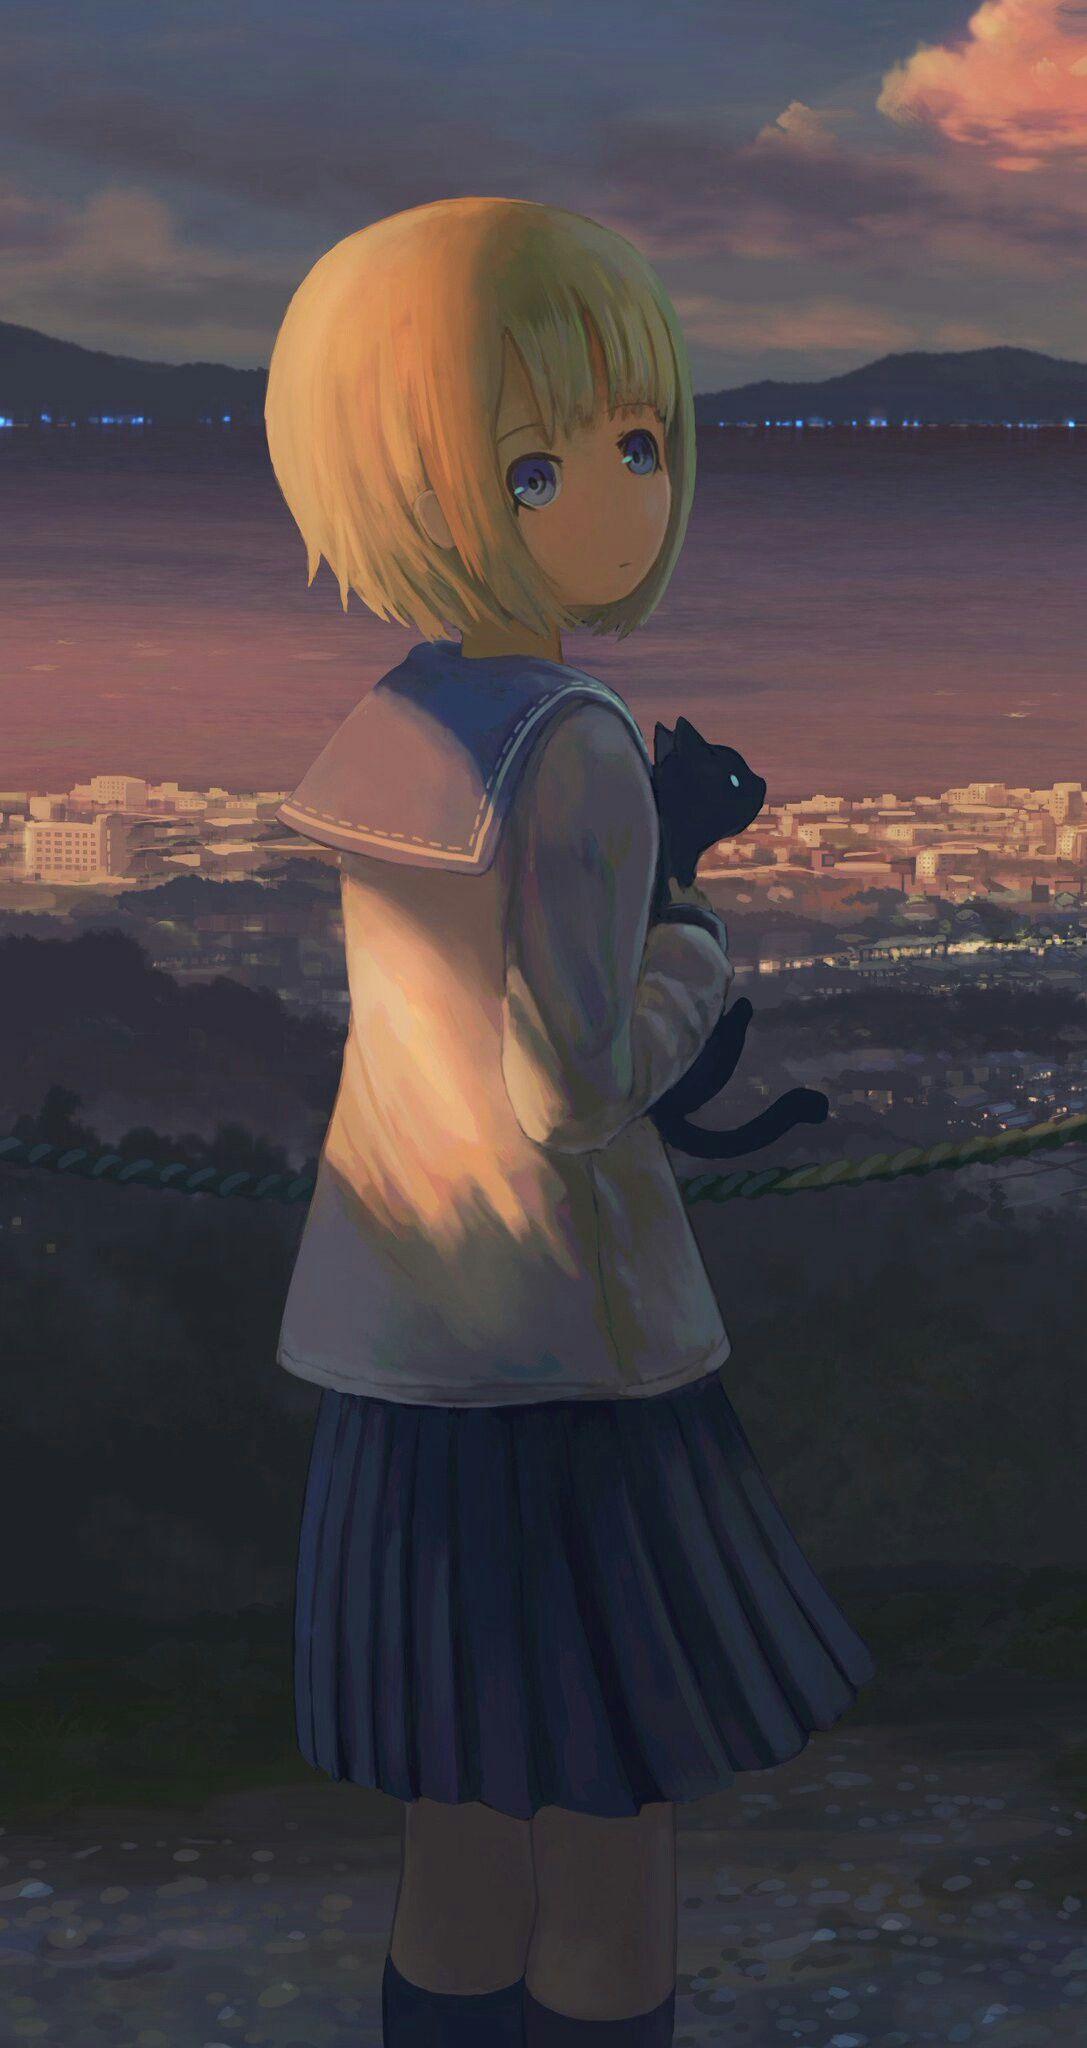 Girls Sky Wallpapers Animegirl Animekawaii Kawaii Sky Wallpapers Girl Kurdishotaku أنمي خلفيات بنات Anime Scenery Anime School Girl Anime